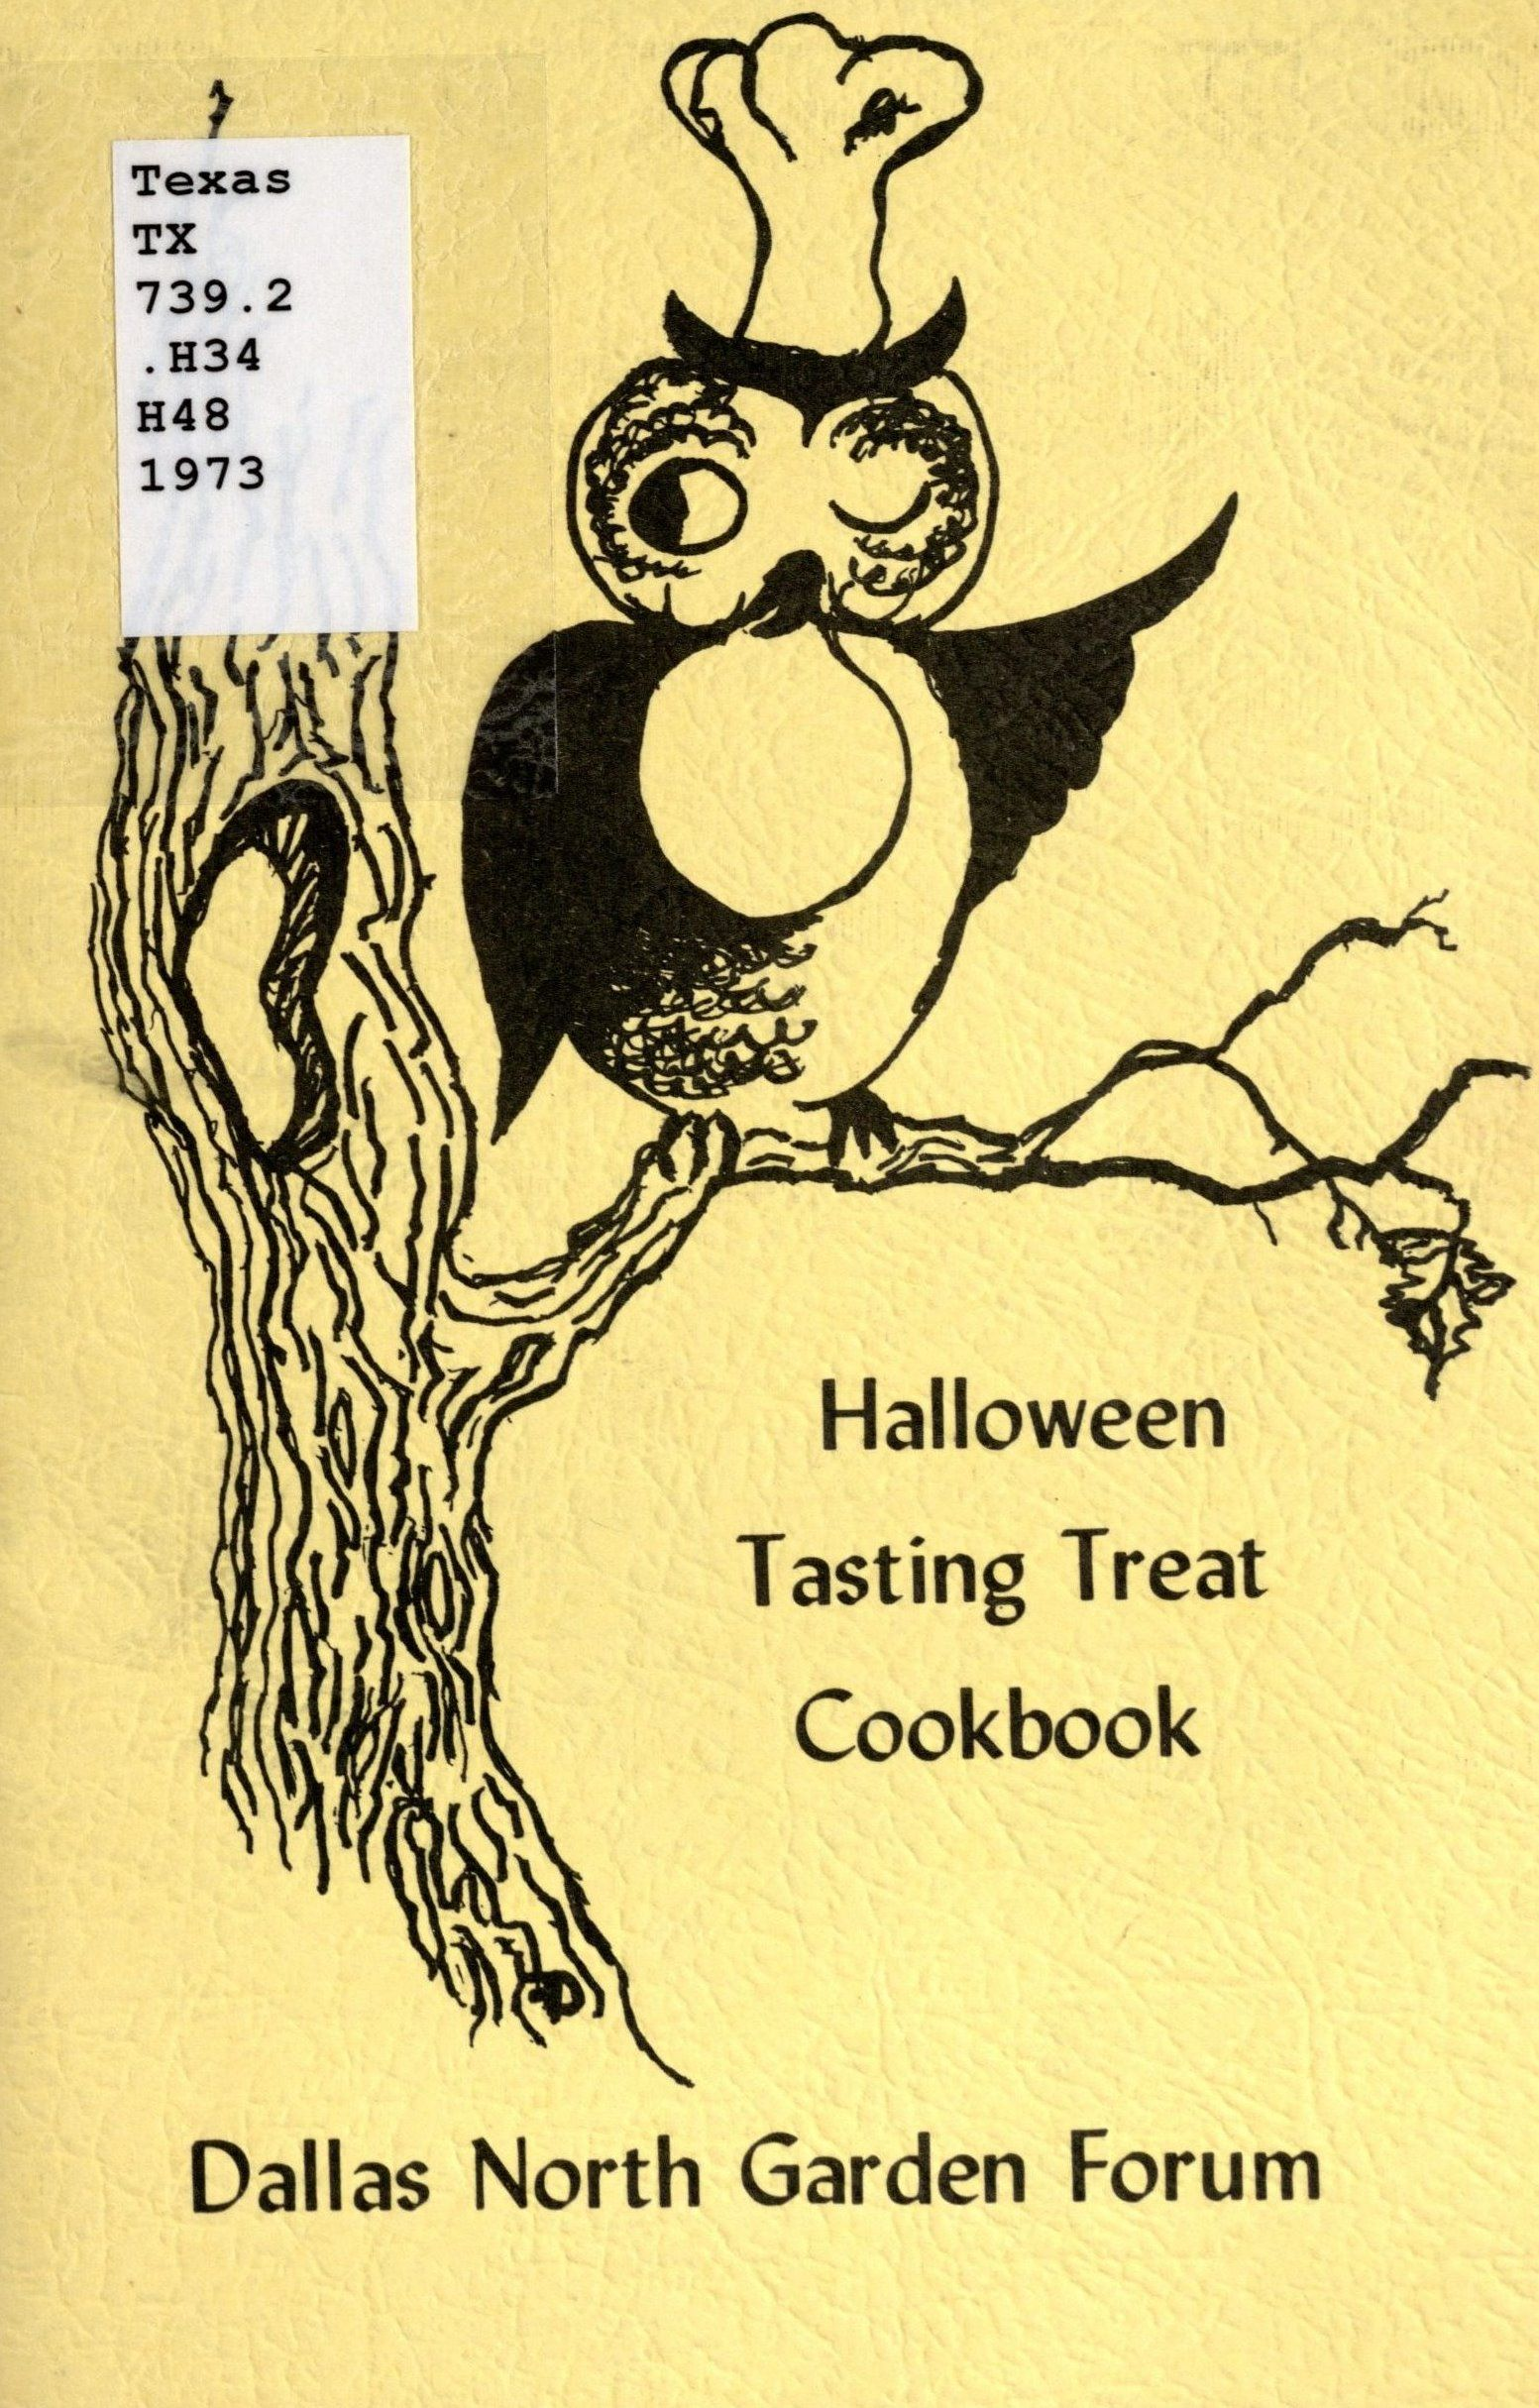 Dallas North Garden Forum. Halloween Tasting Treat Luncheon Cook Book. [Dallas, TX]: 1973. Print.